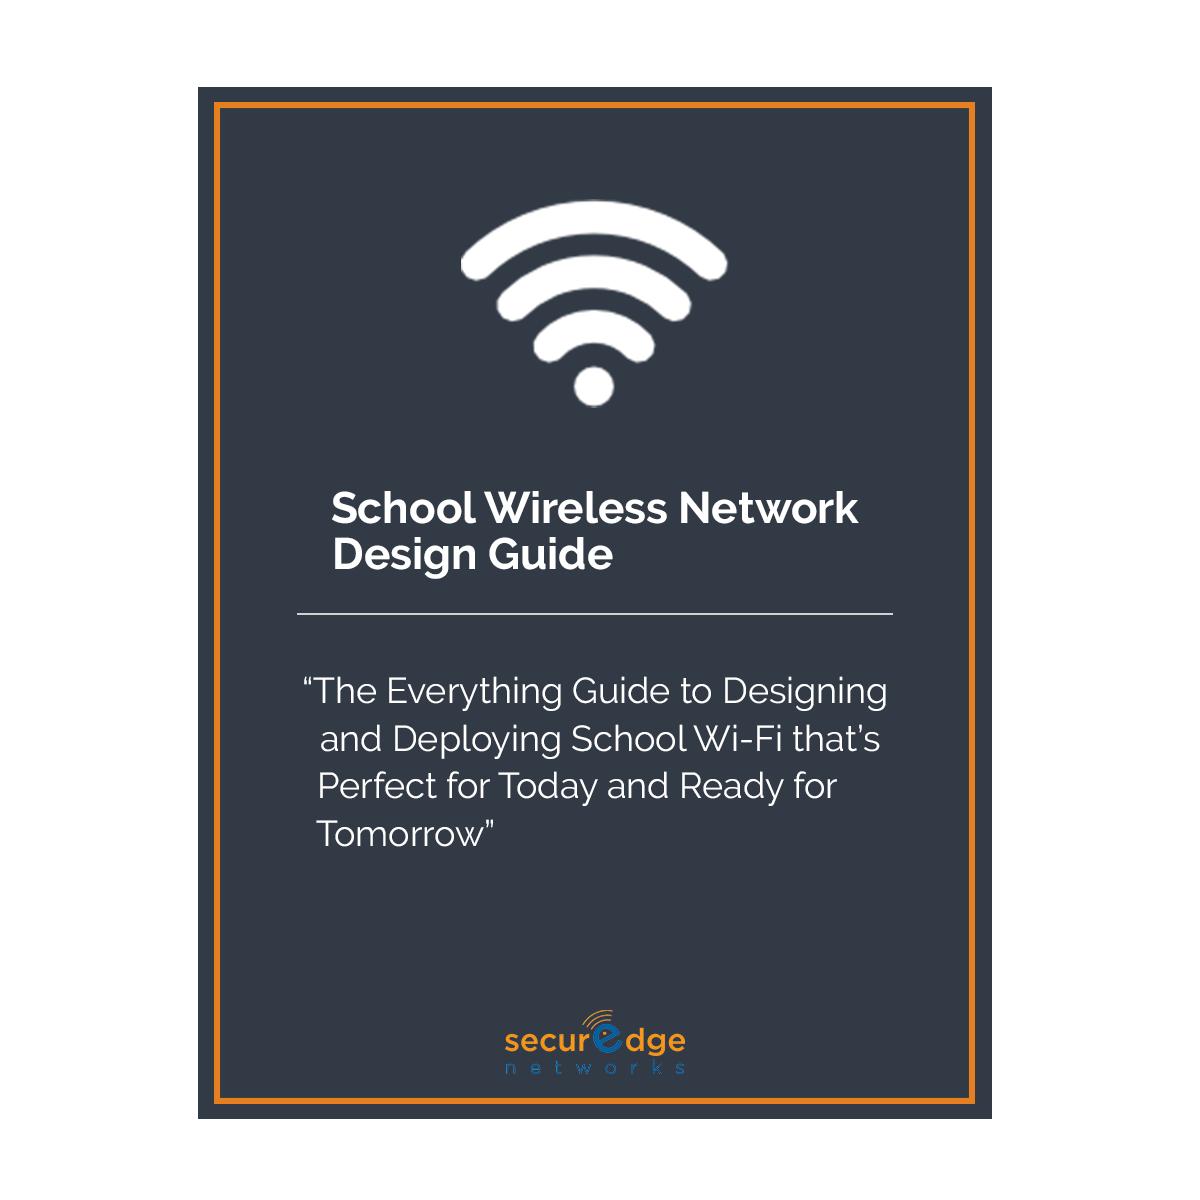 school wireless network design guide